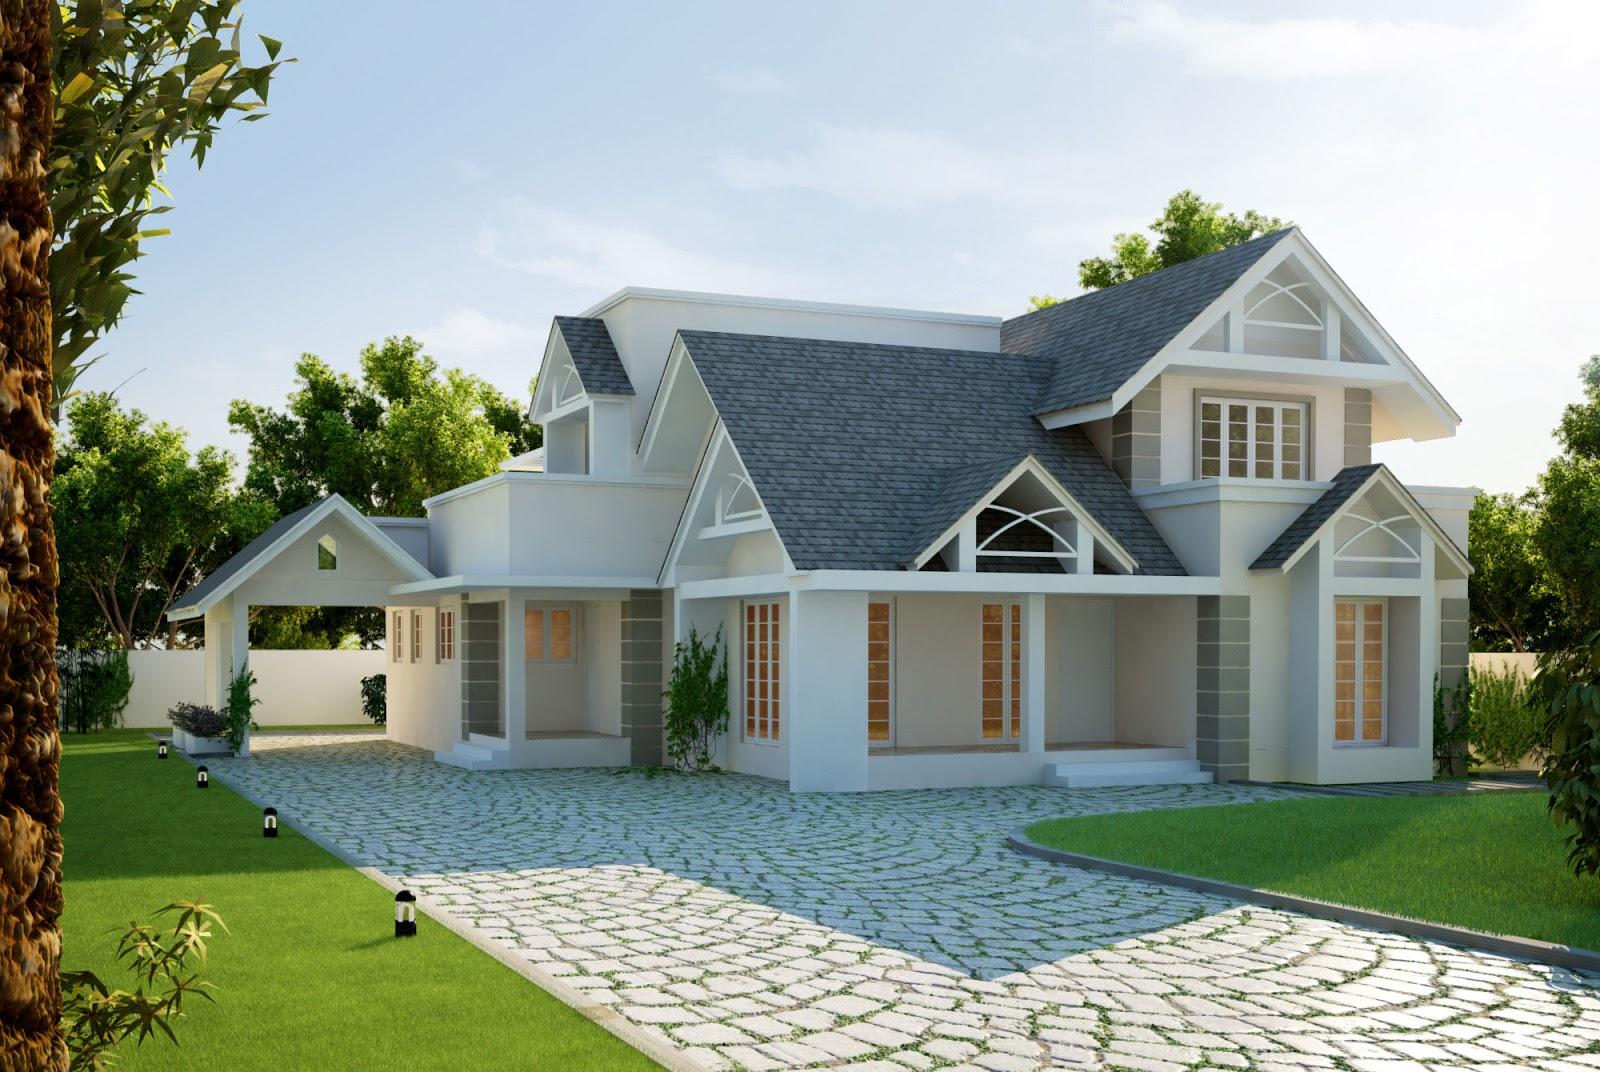 Desain Rumah Eropa Sederhana DesainRumahMinicom